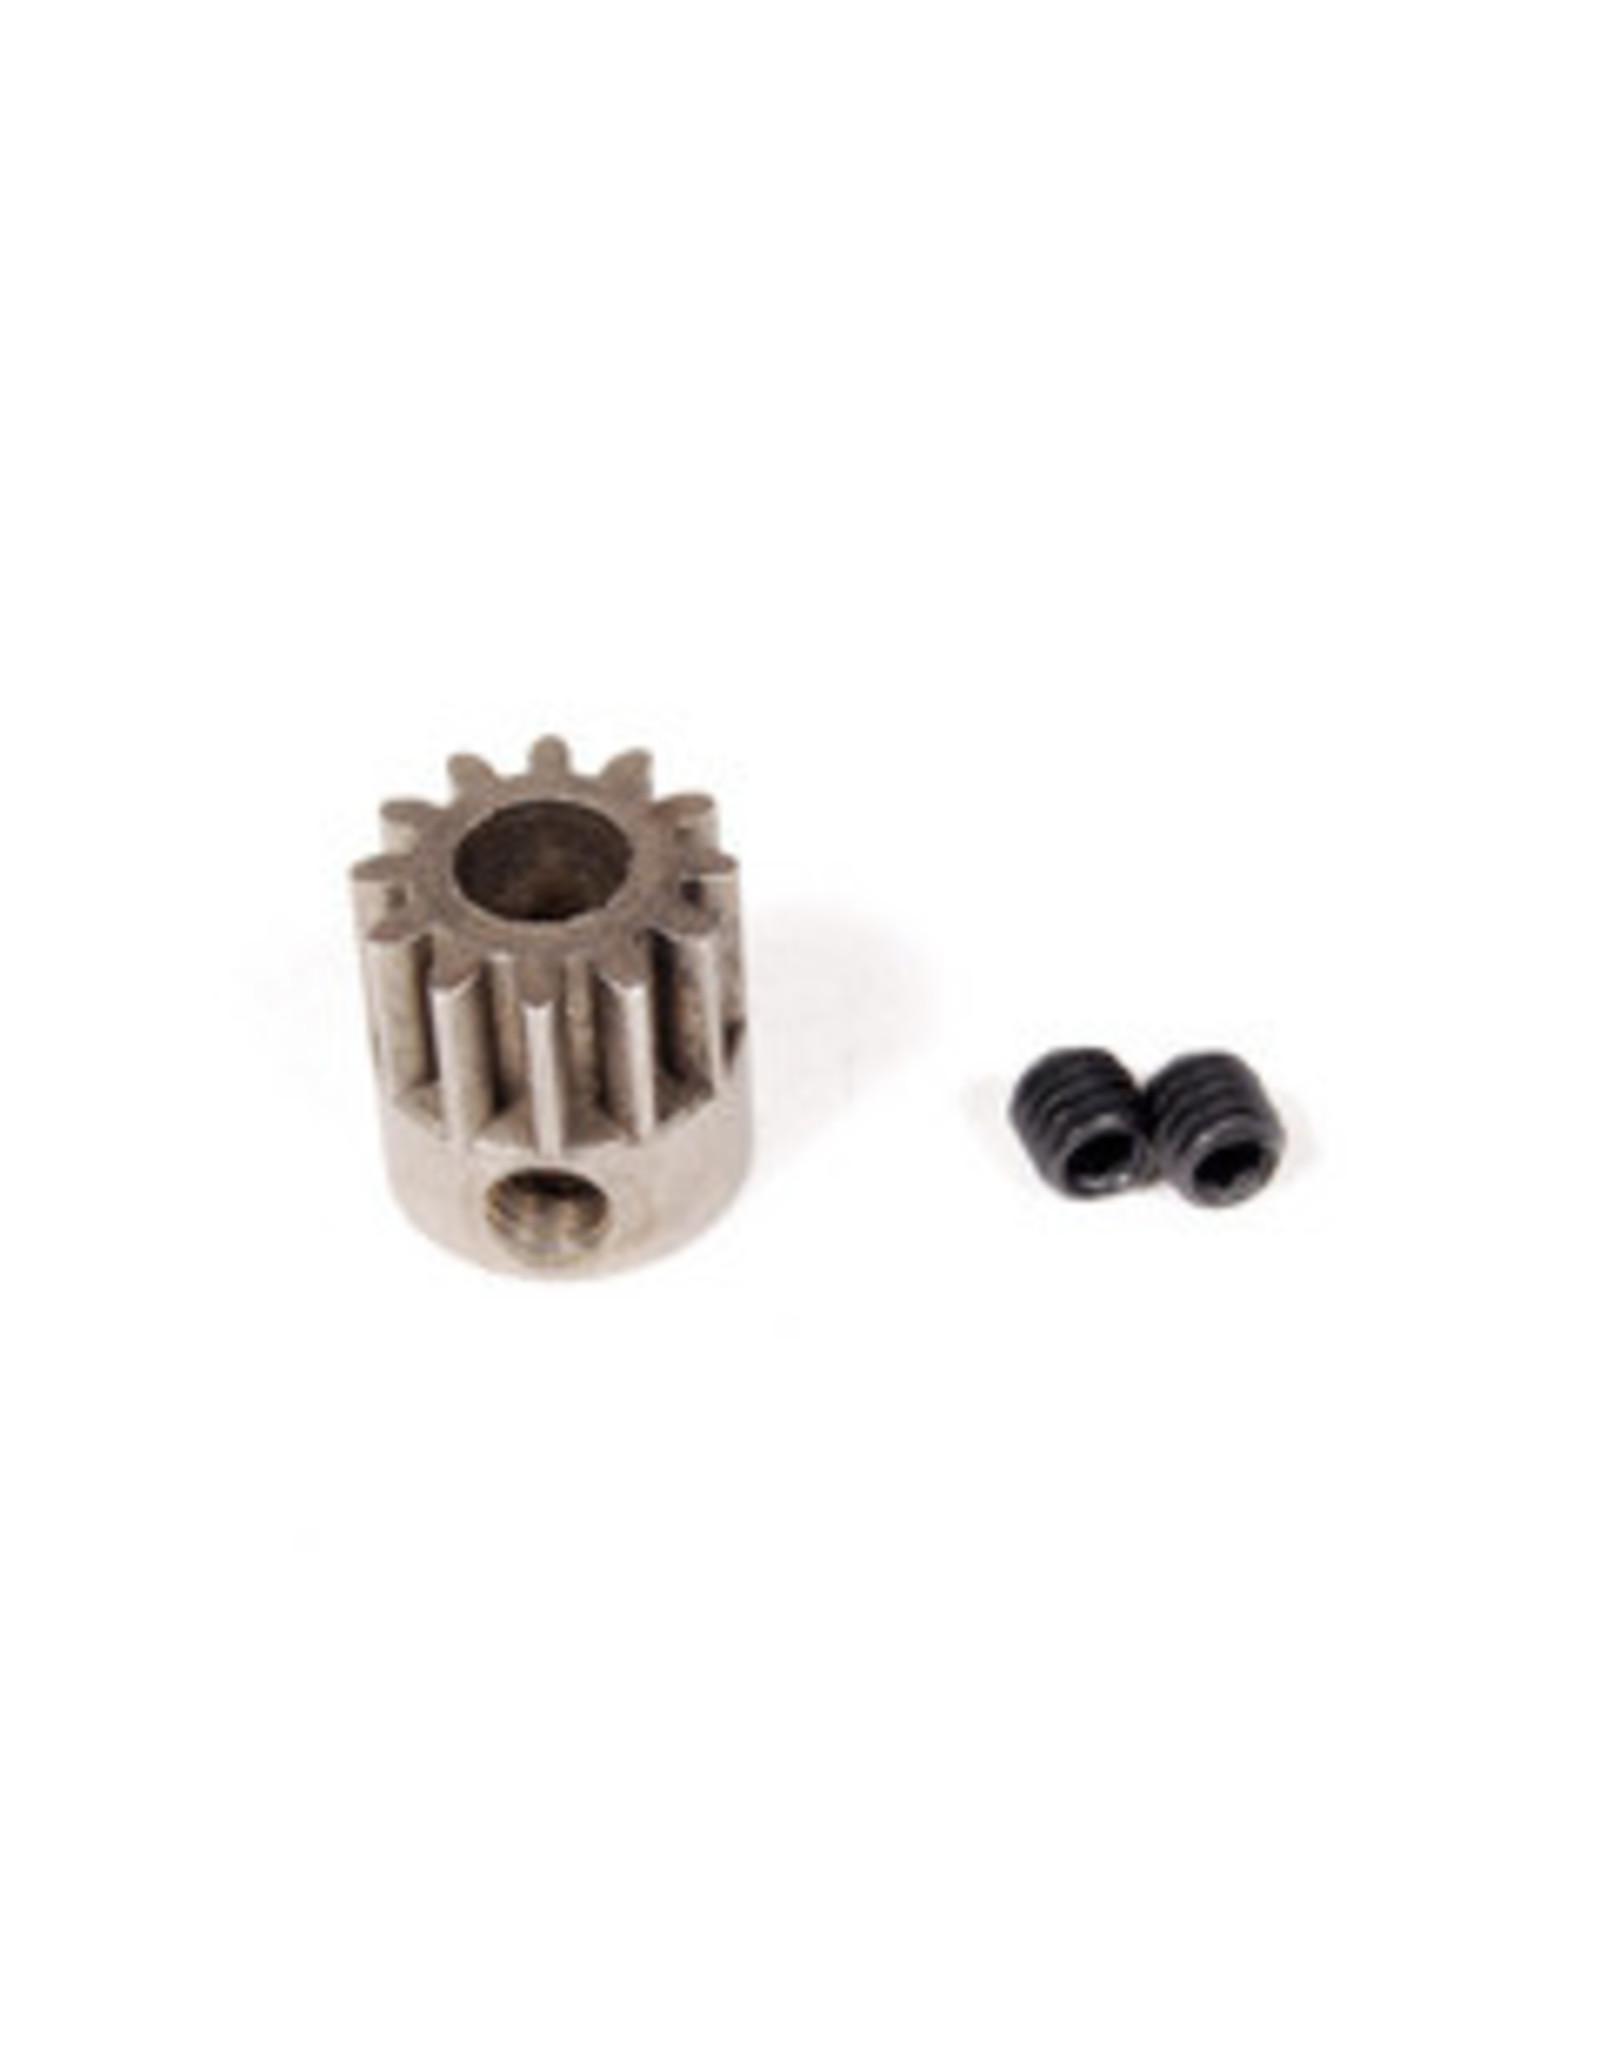 Axial Axial Pinion Gear 32P 12T Steel 5mm Motor Shaft (AX30838)